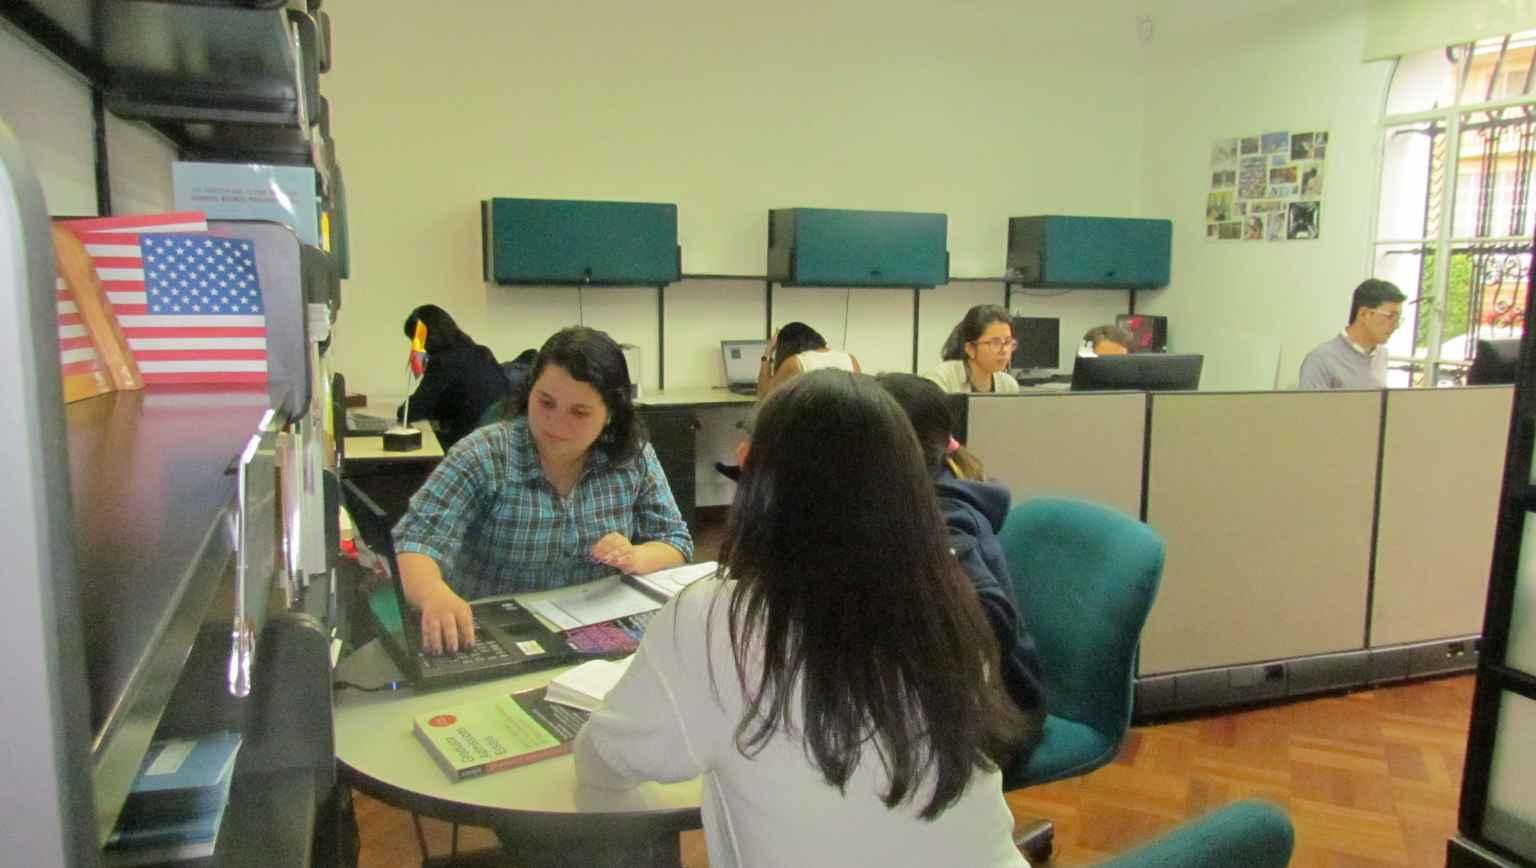 International student meeting with advisor at EducationUSA advising center